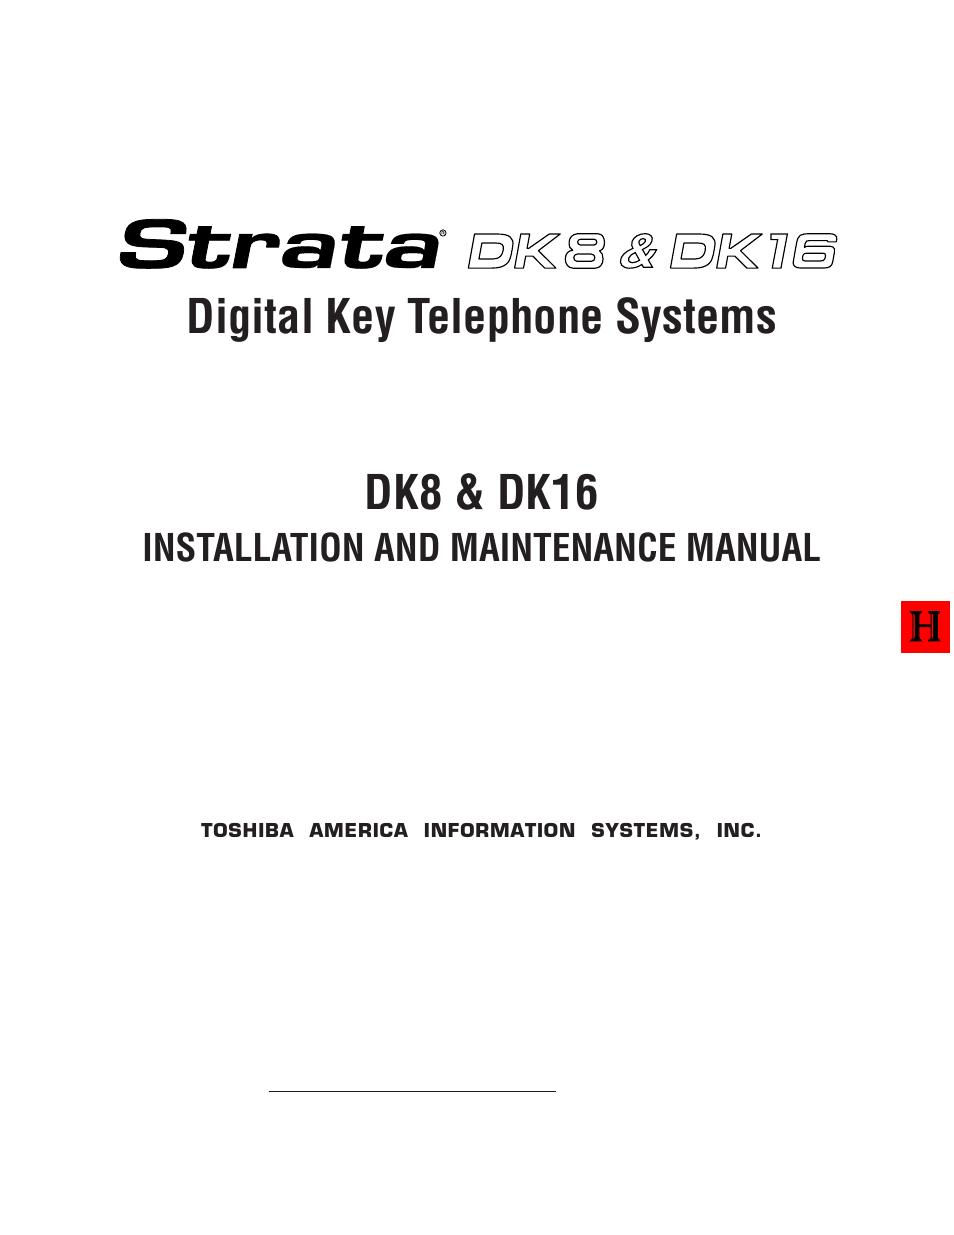 Toshiba Strata Wiring Diagram Schematic Diagrams T300mvi Dk8 User Manual 321 Pages Mitsubishi Split System